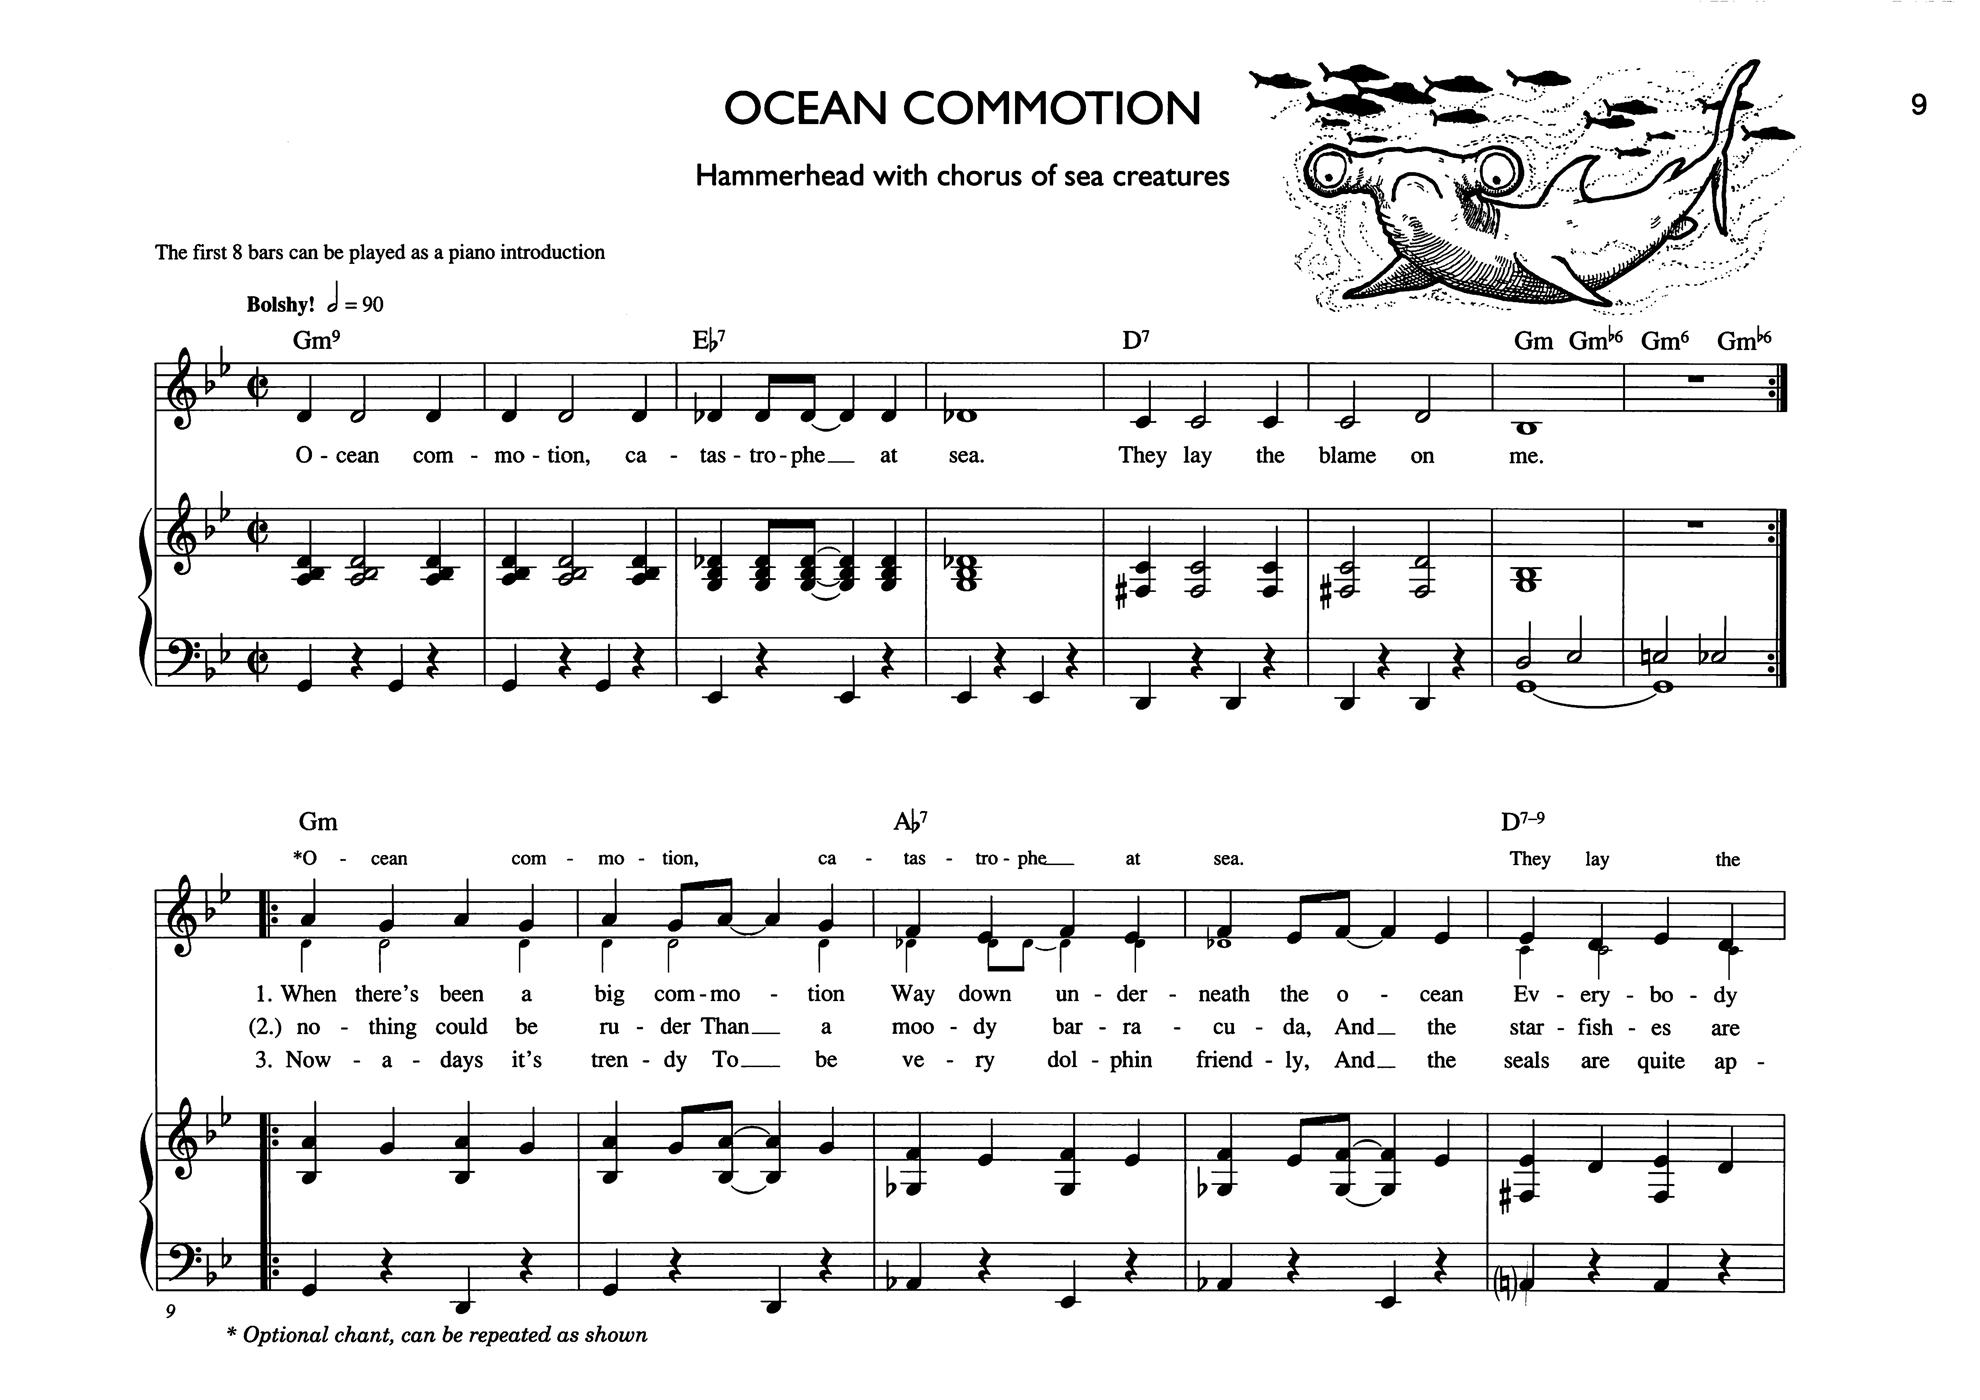 Ocean Commotion_Score_Sample